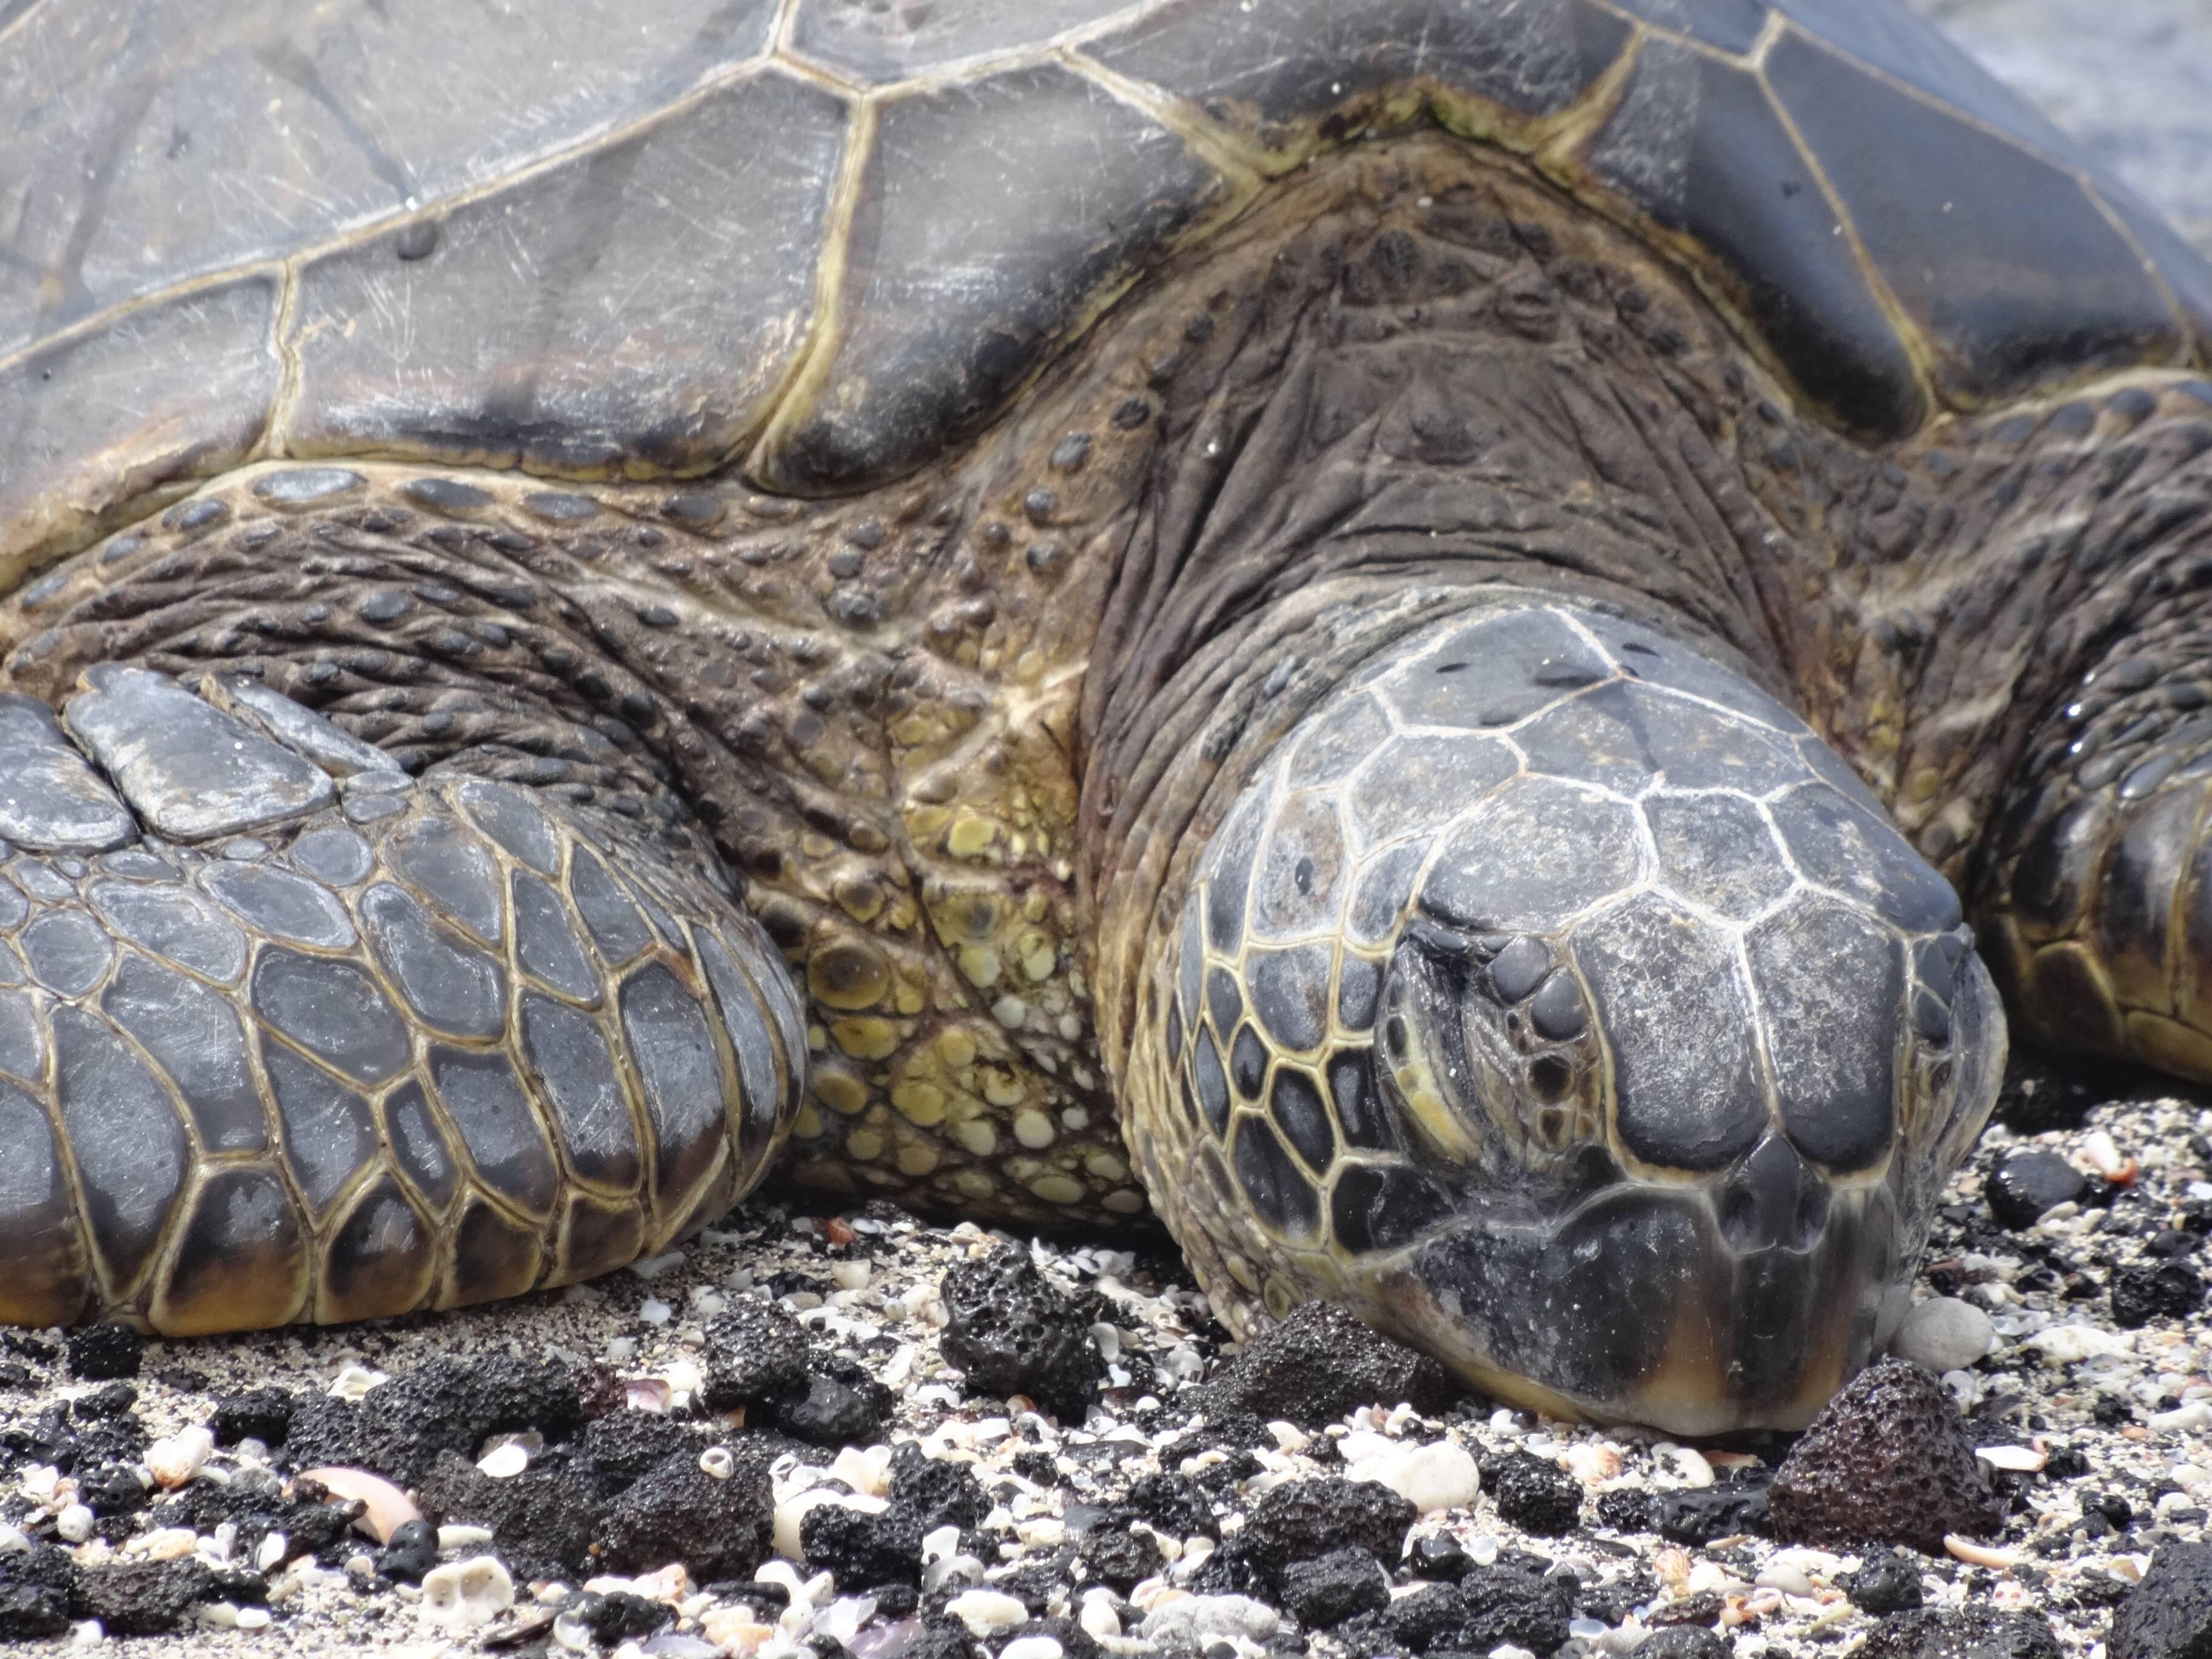 Спячка черепах: условия успешной зимовки